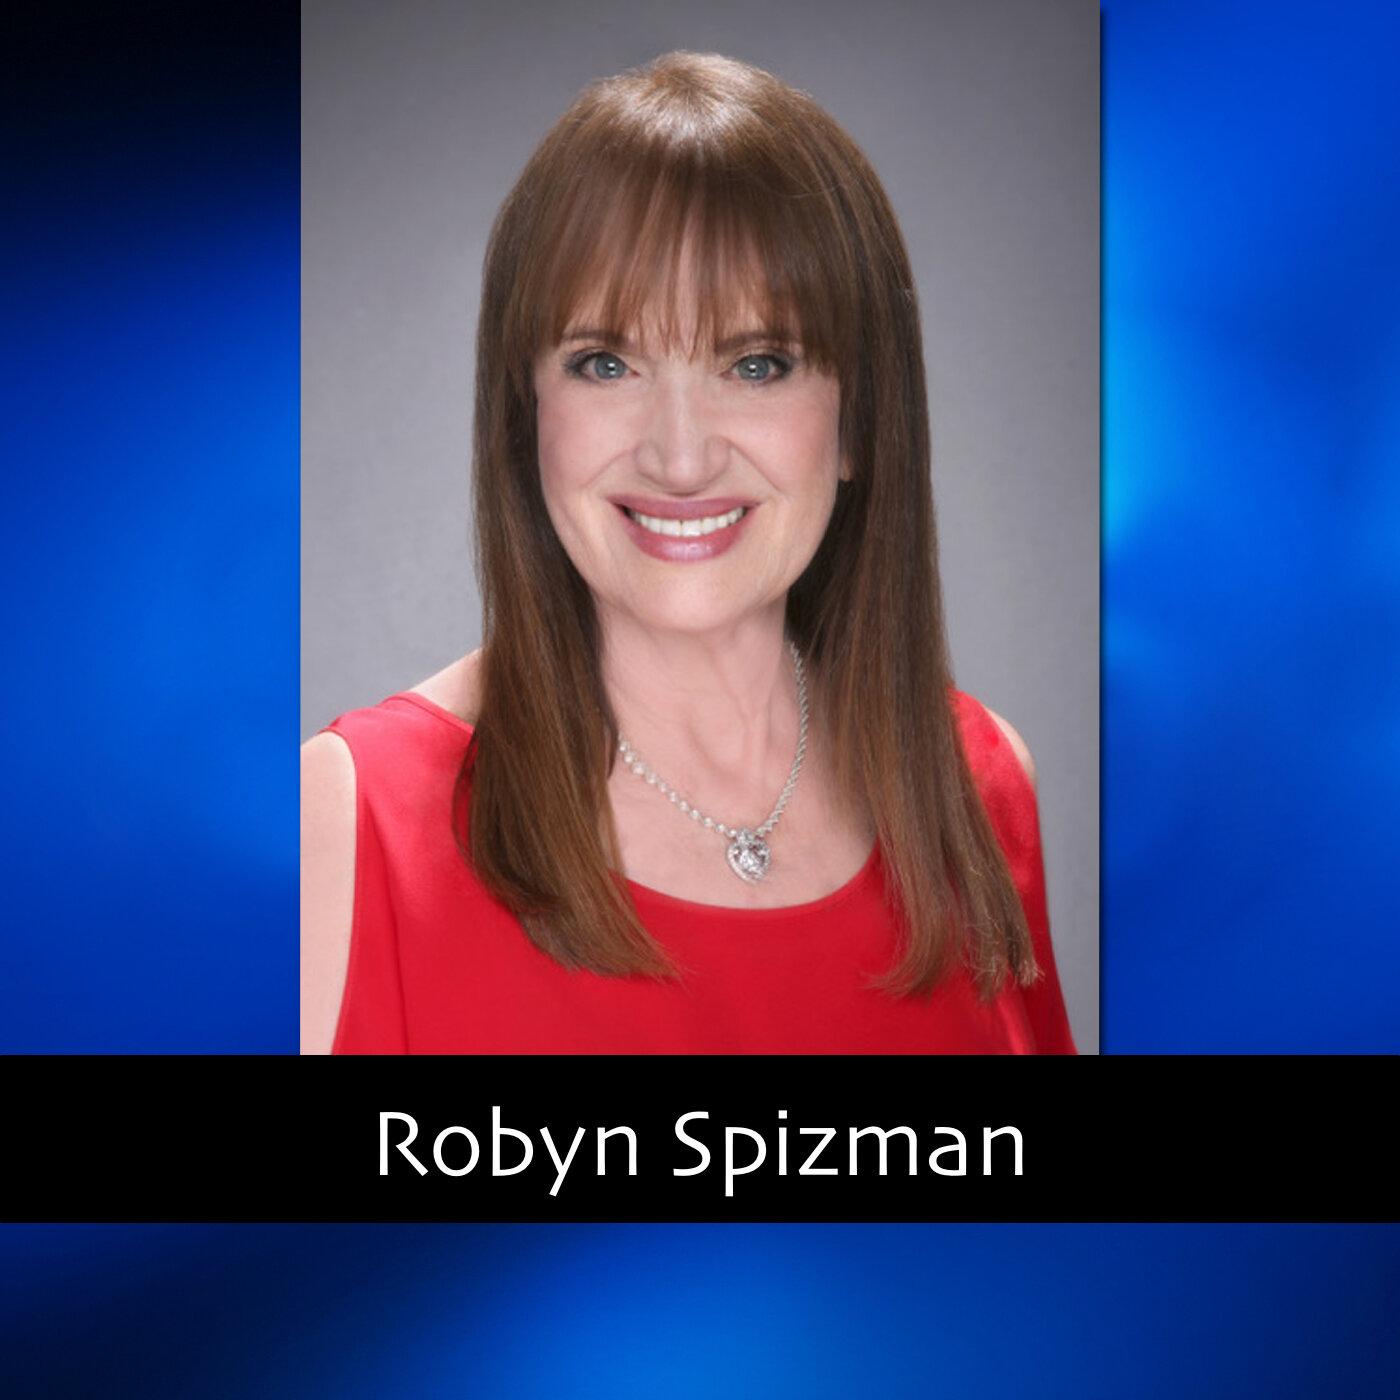 Robyn Spizman Thumb.jpg